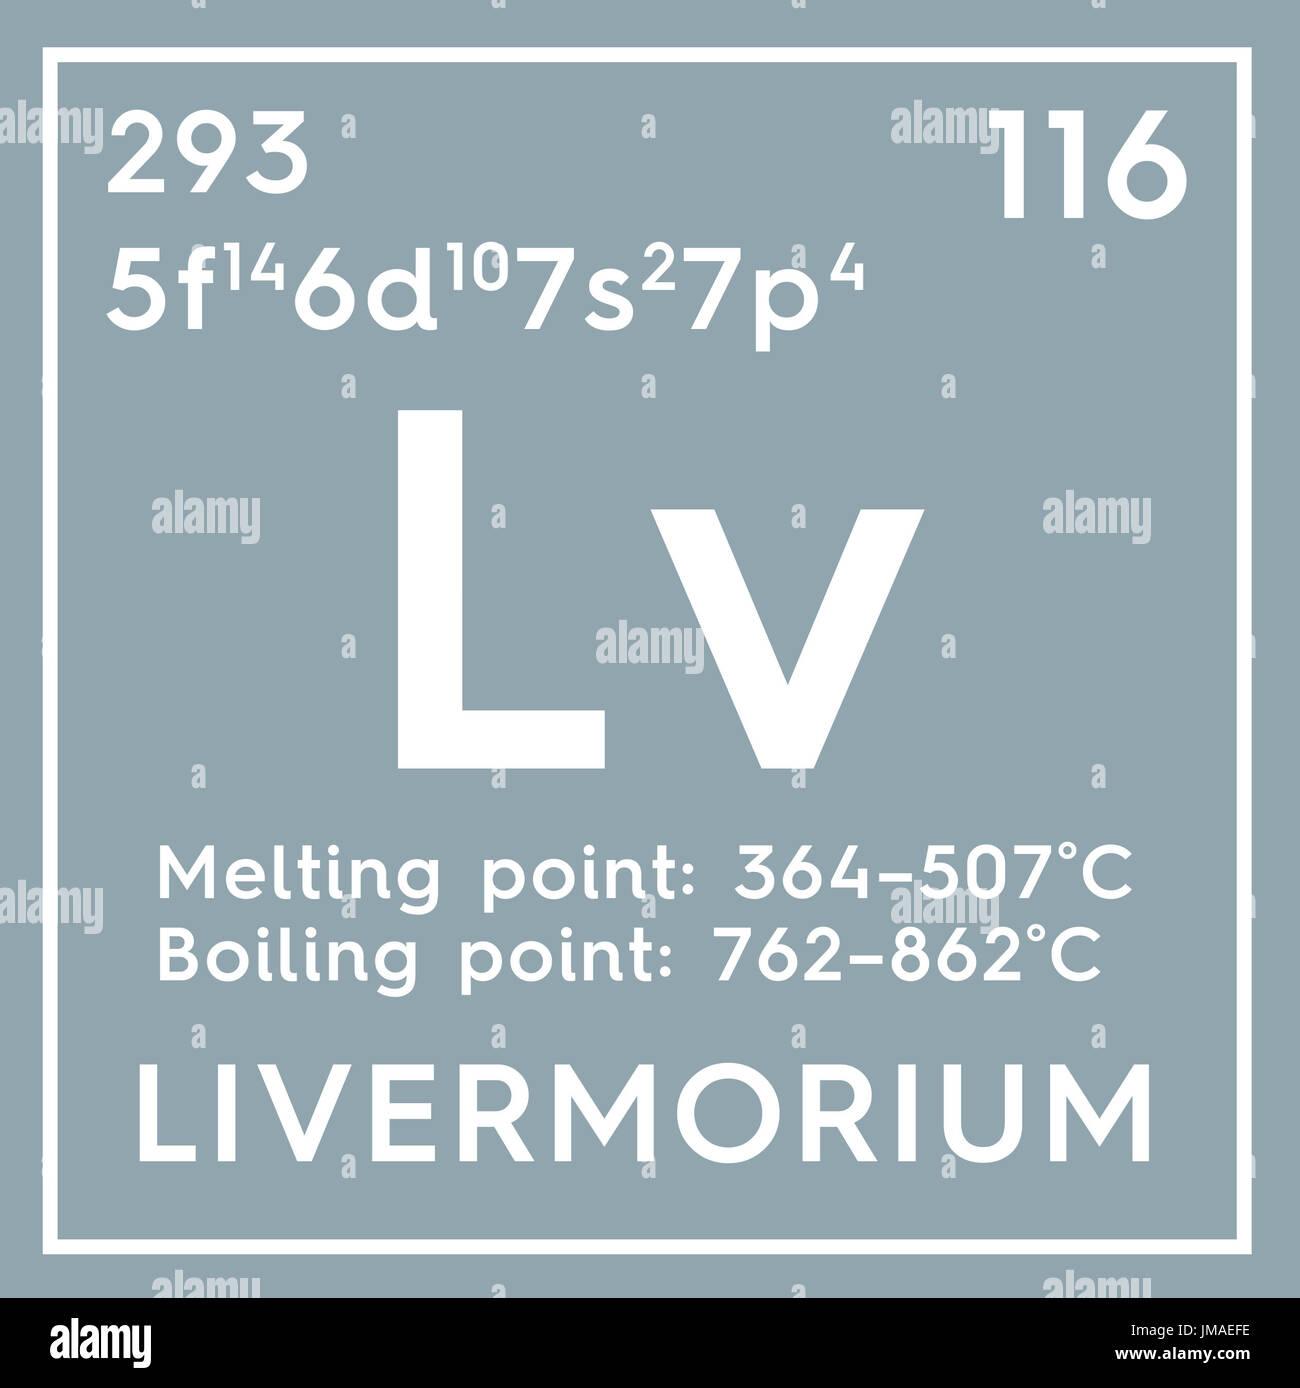 Livermorium periodic table image collections periodic table images livermorium post transition metals chemical element of livermorium post transition metals chemical element of mendeleevs periodic gamestrikefo Images